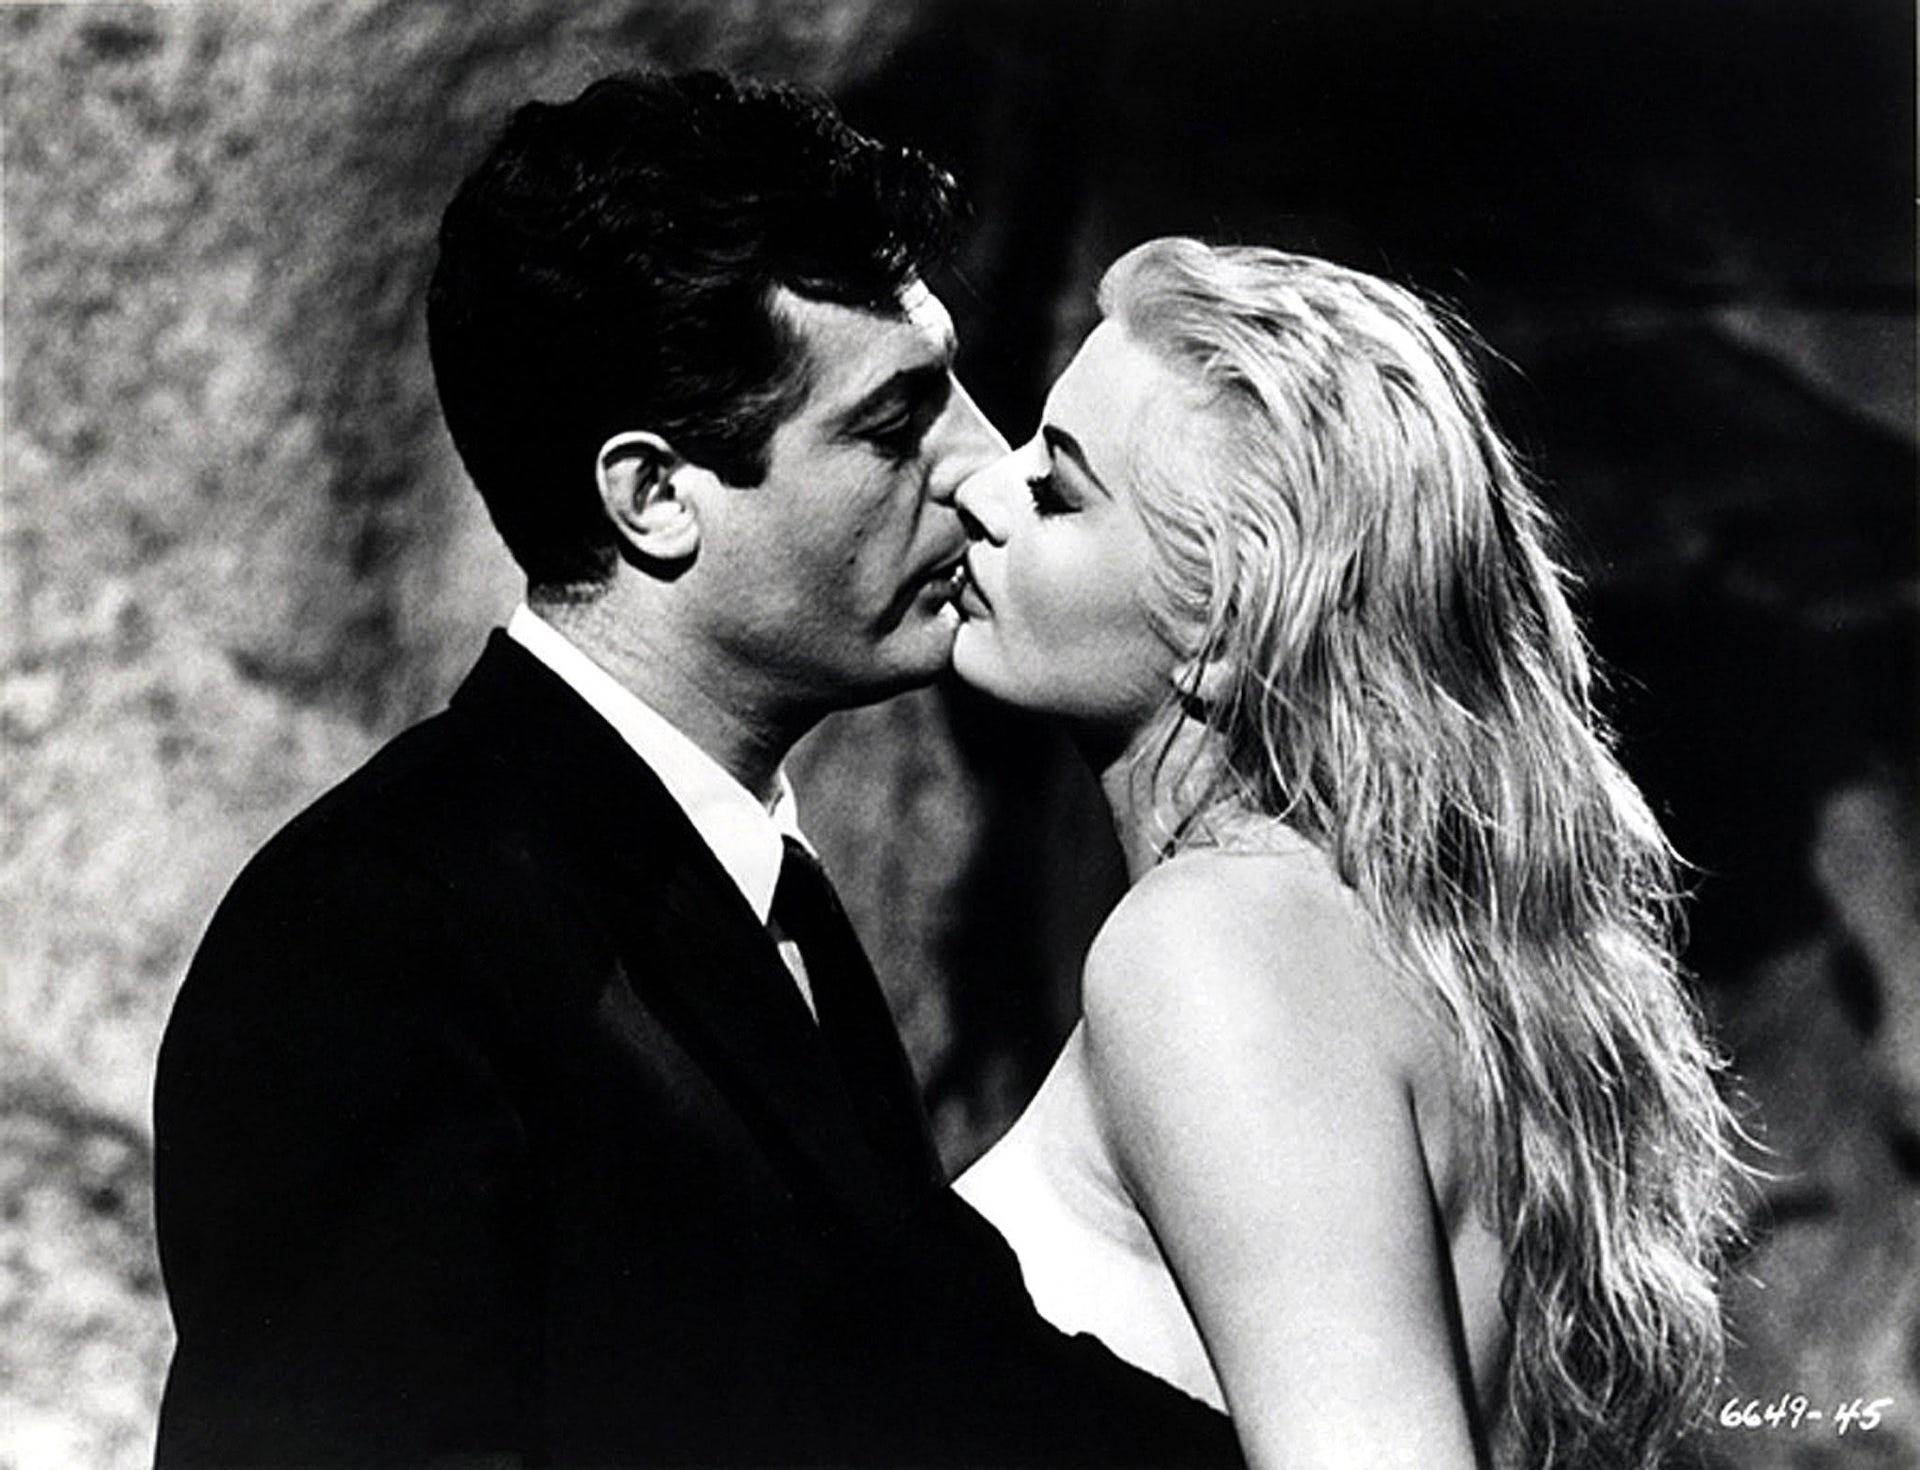 Federico Fellini\u0027s 1960 film La Dolce Vita showing Marcello Mastroianni kissing Anita Ekberg. EPA/ Blue Box Toys/ HO & Explainer: film lighting